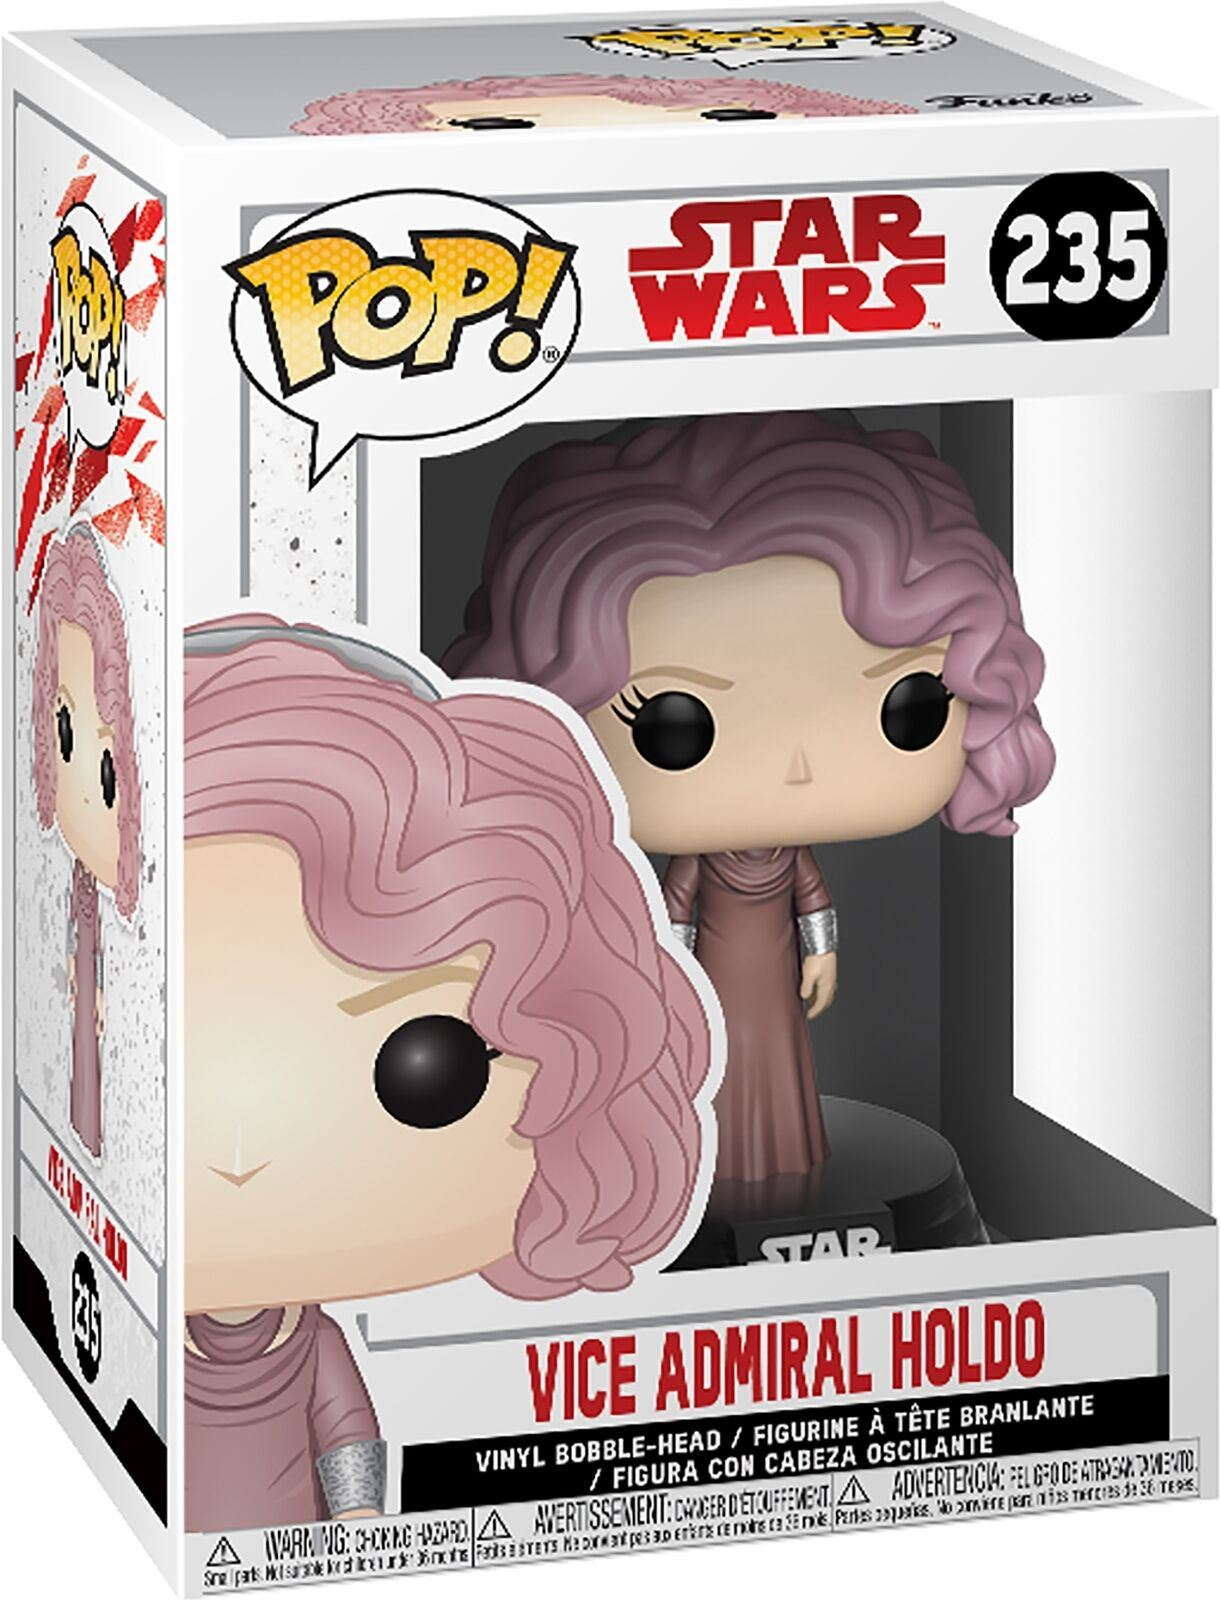 Funko POP Vinyle Star Wars The Last Jedi vice-amiral holdo #235 Figure